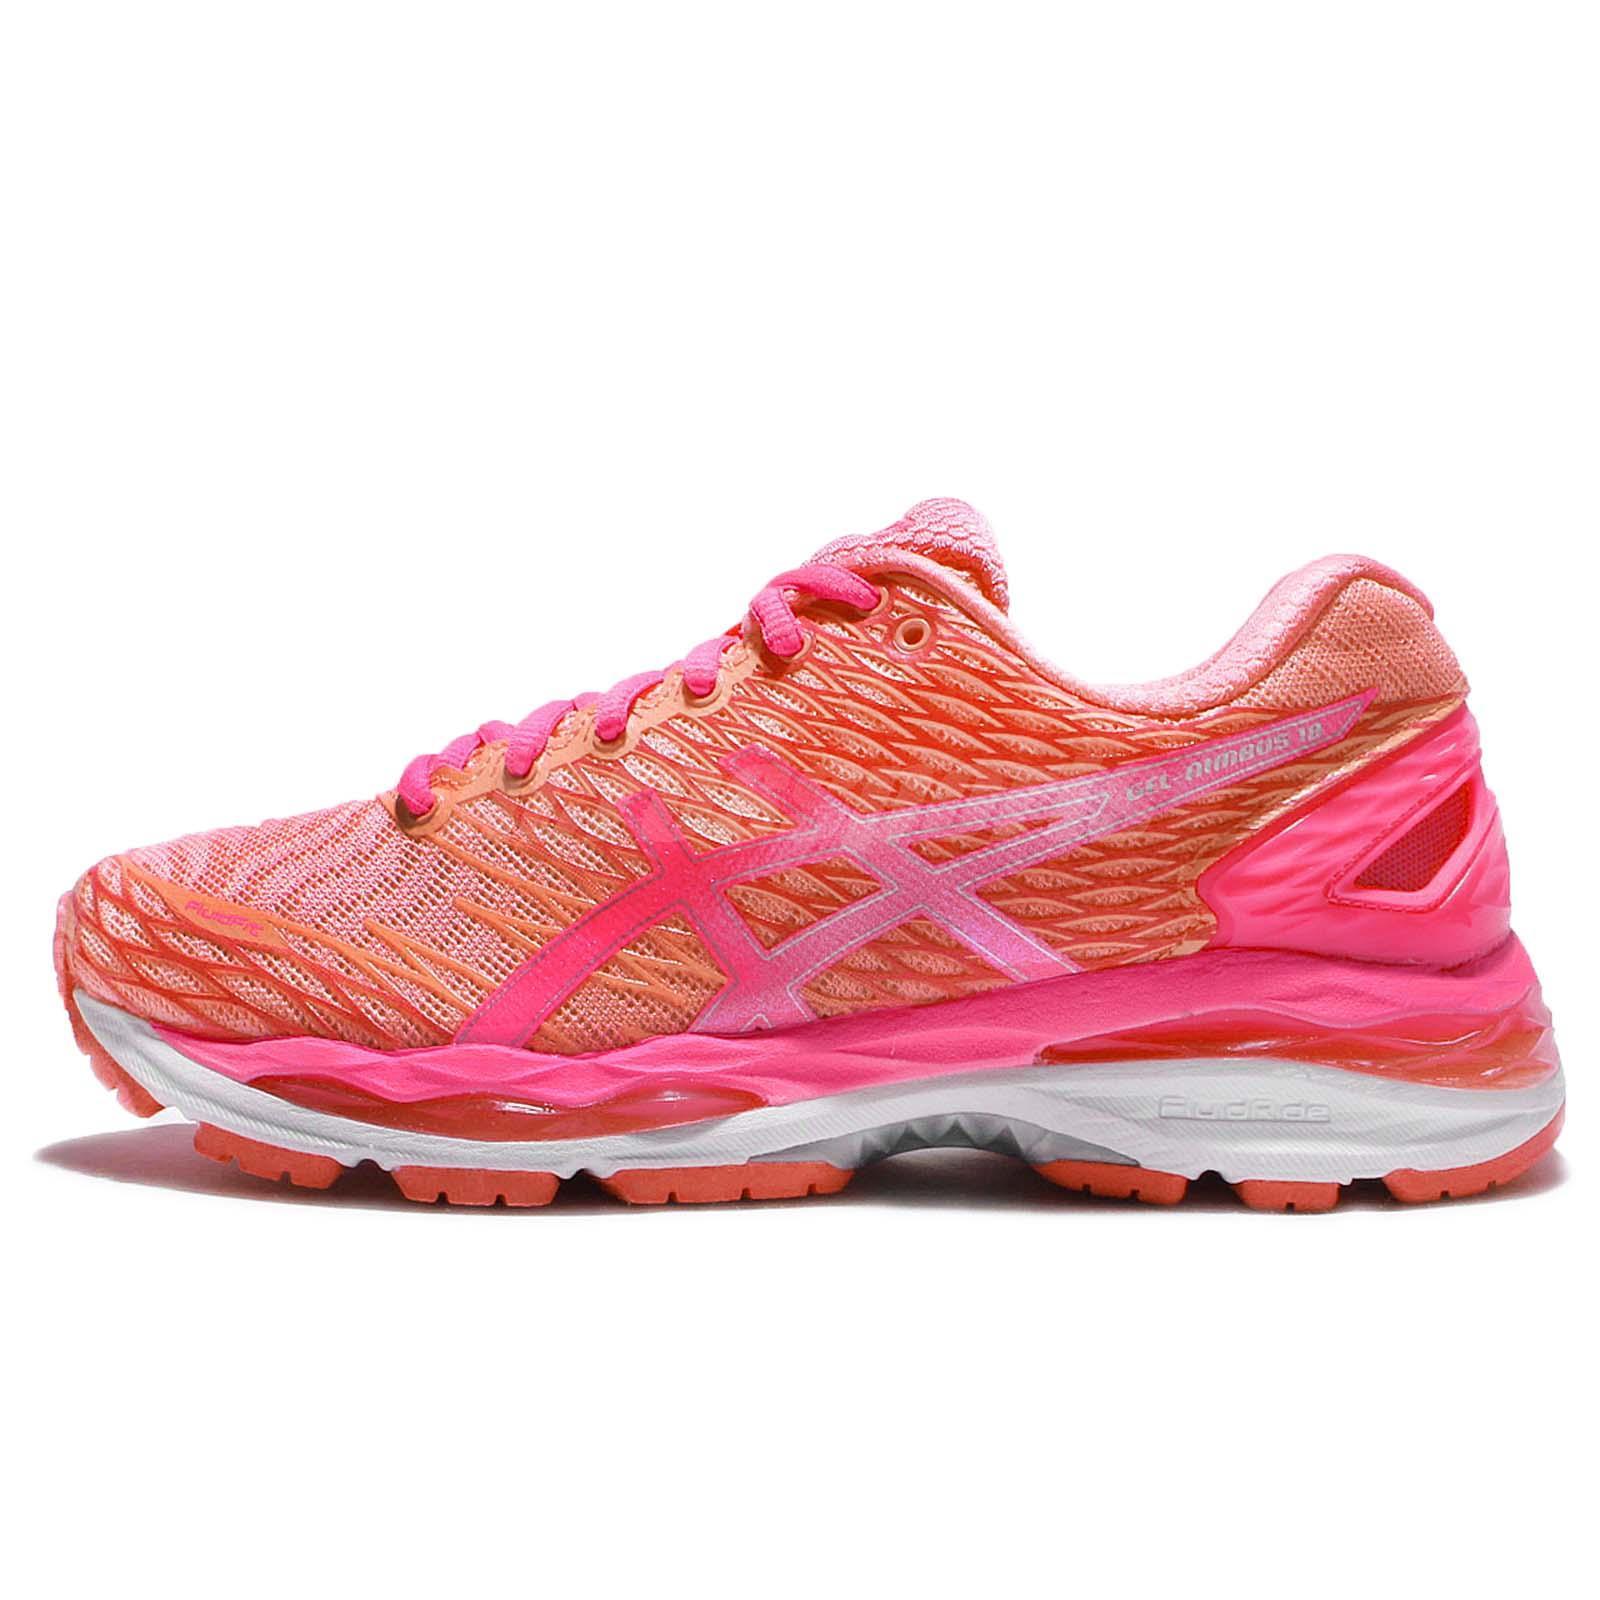 Asics Gel-Nimbus Salmone-Pink 18 Donna